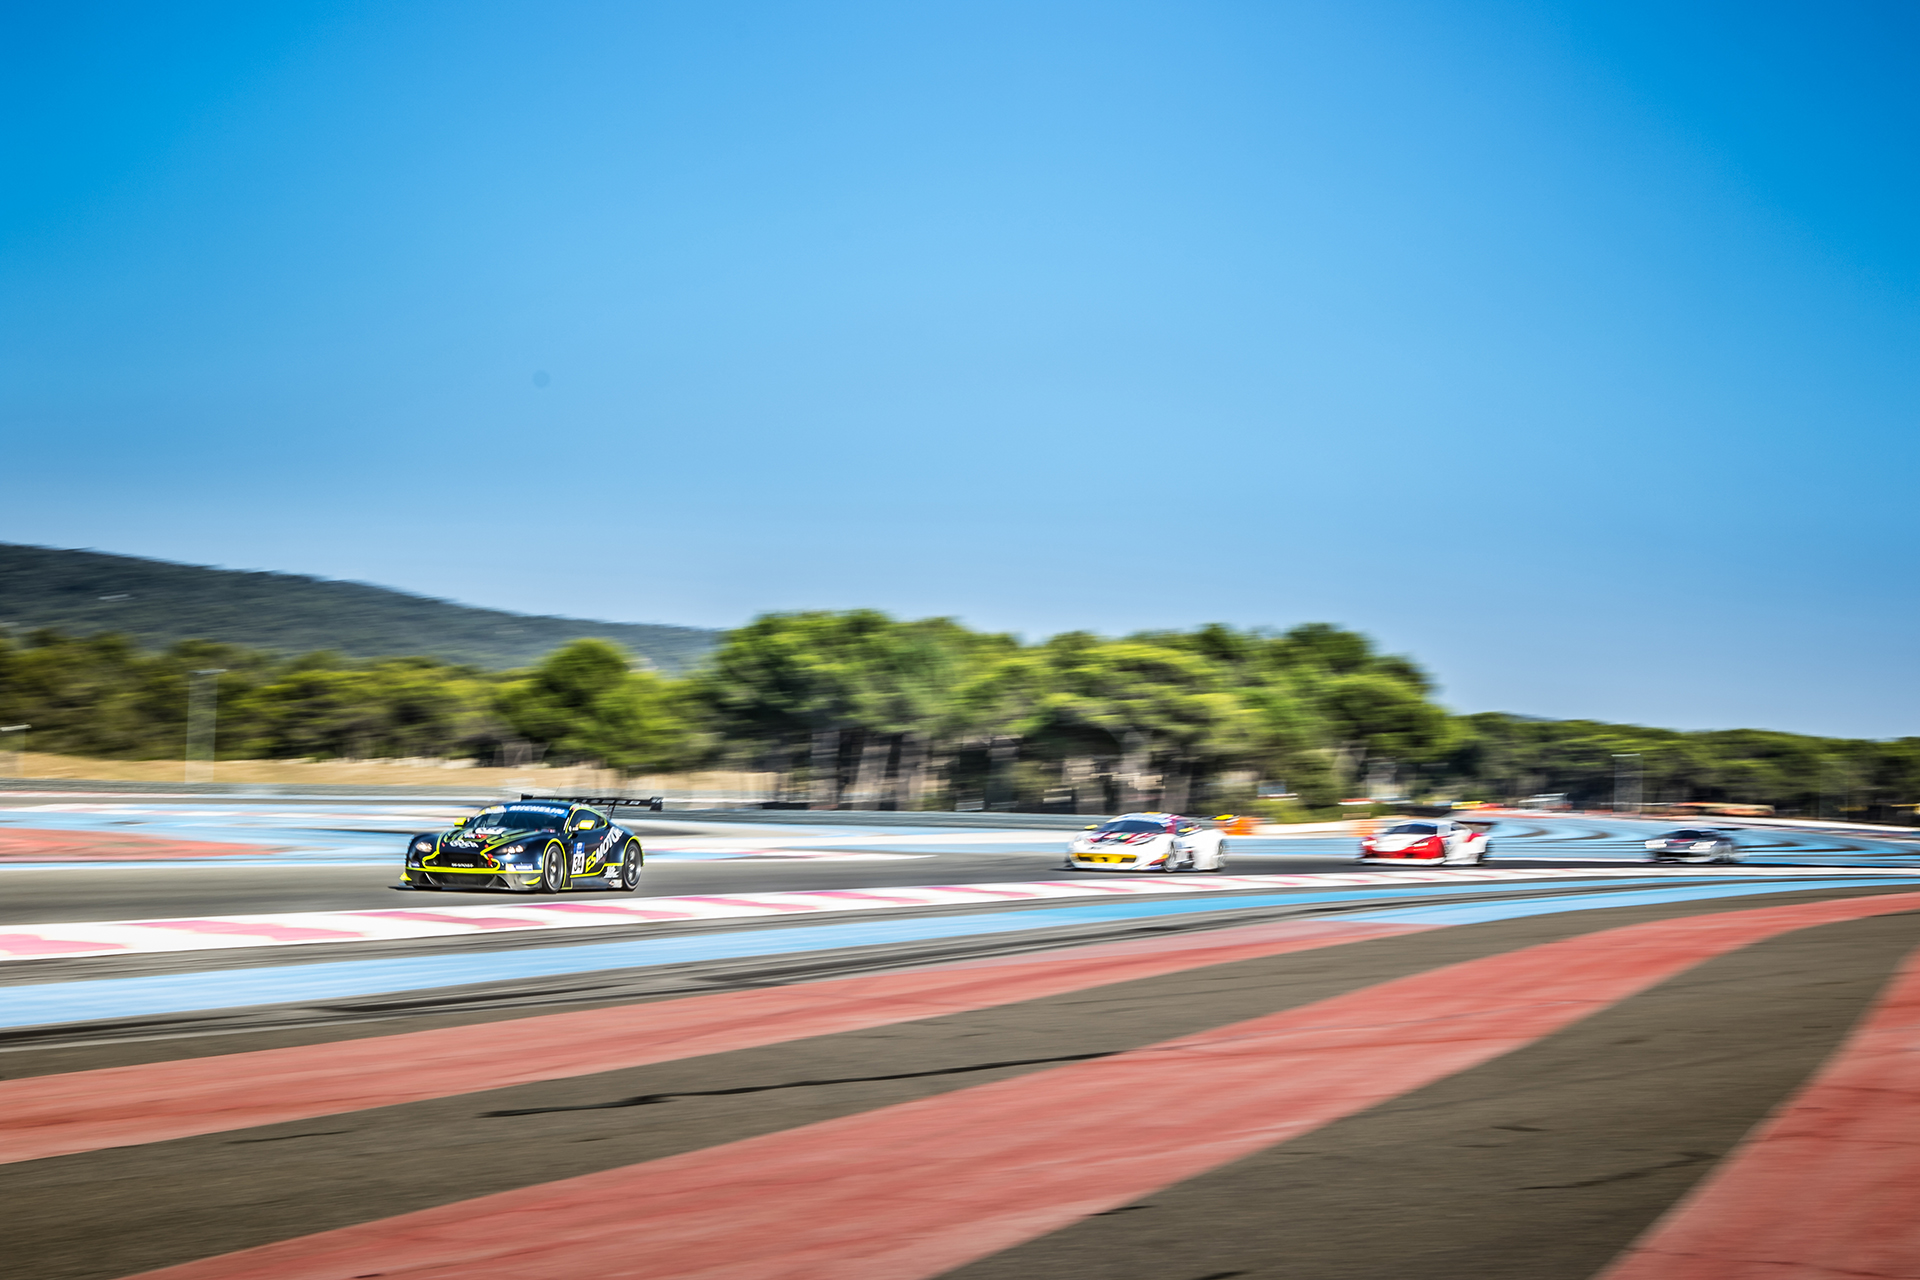 2016-GT3-LeMansCup-PaulRicard-72096.jpg